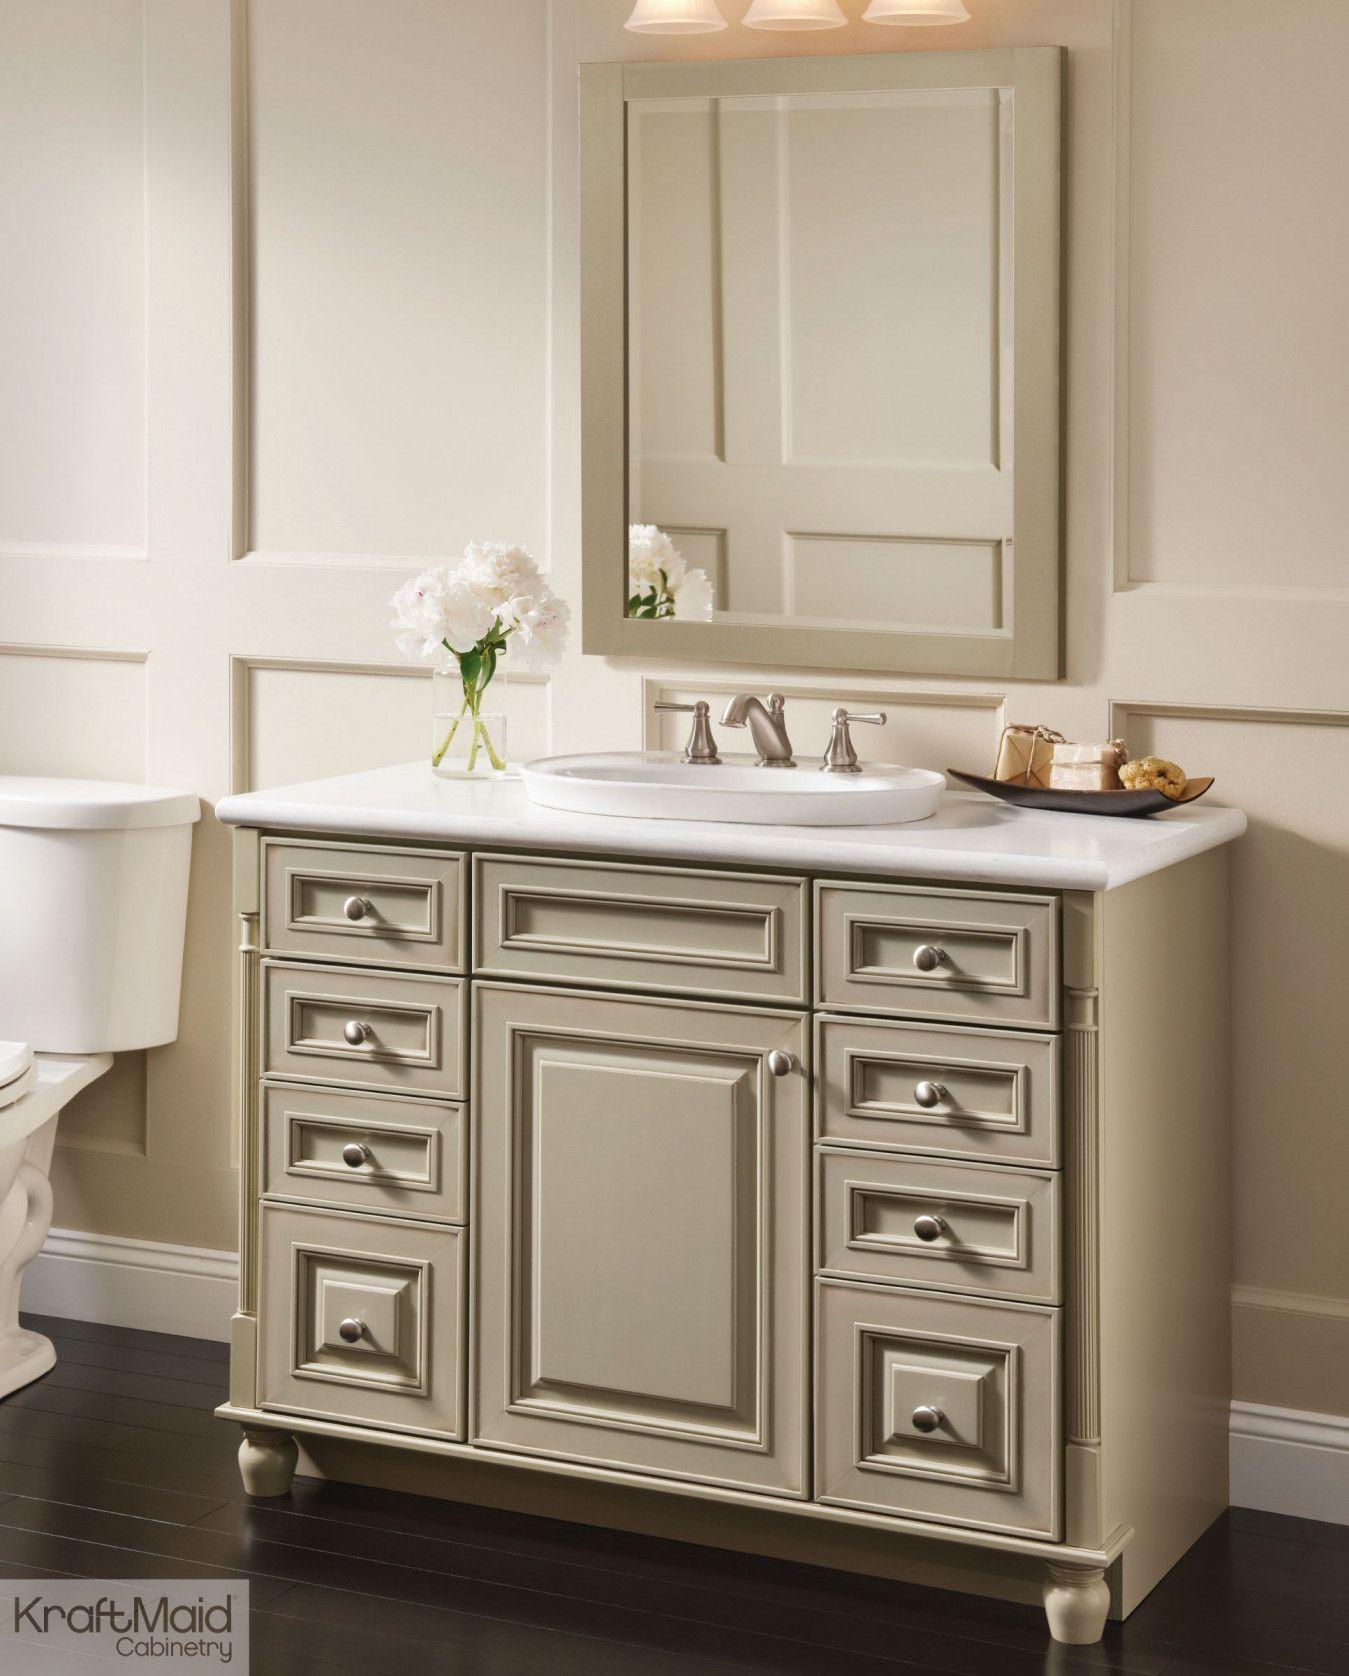 70 Kraftmaid Bathroom Vanity Cabinets Kitchen Shelf Display Ideas